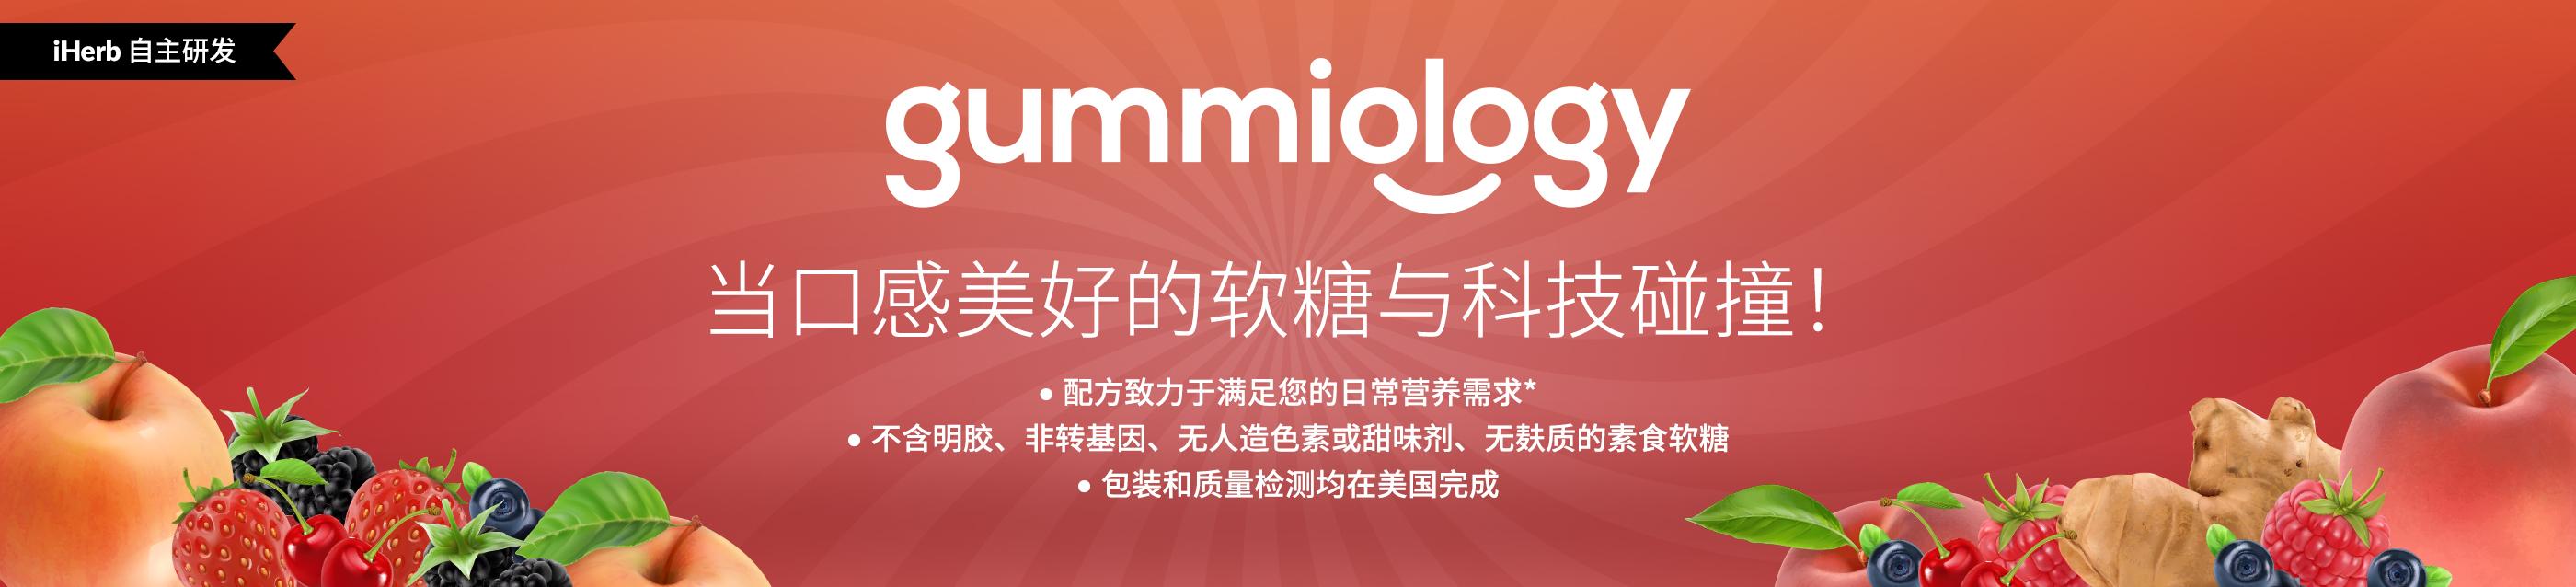 Gummiology